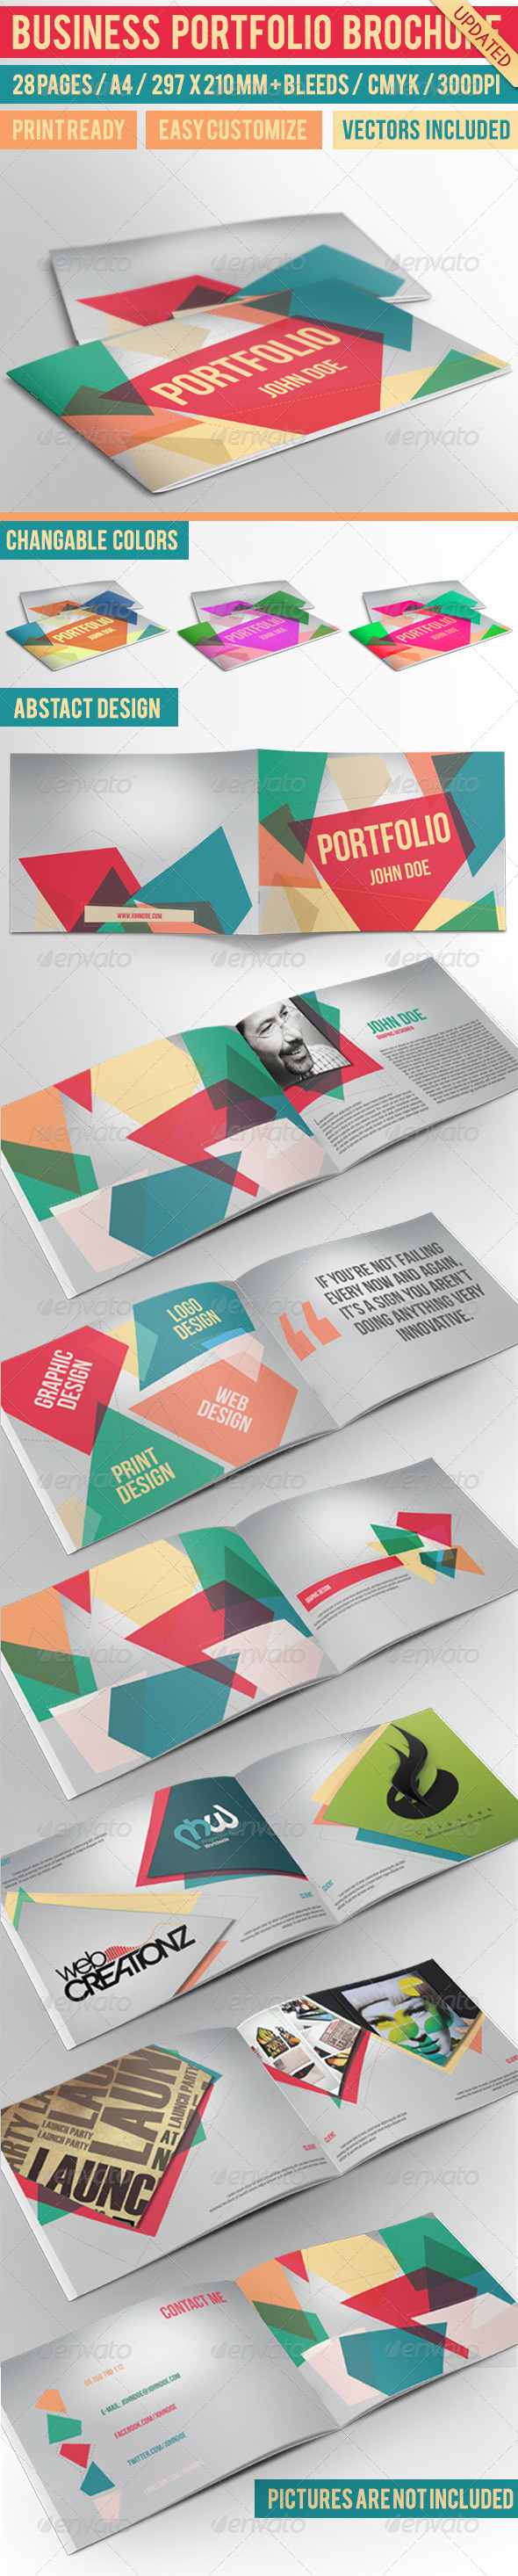 Business Portfolio Brochure - Portfolio Brochures